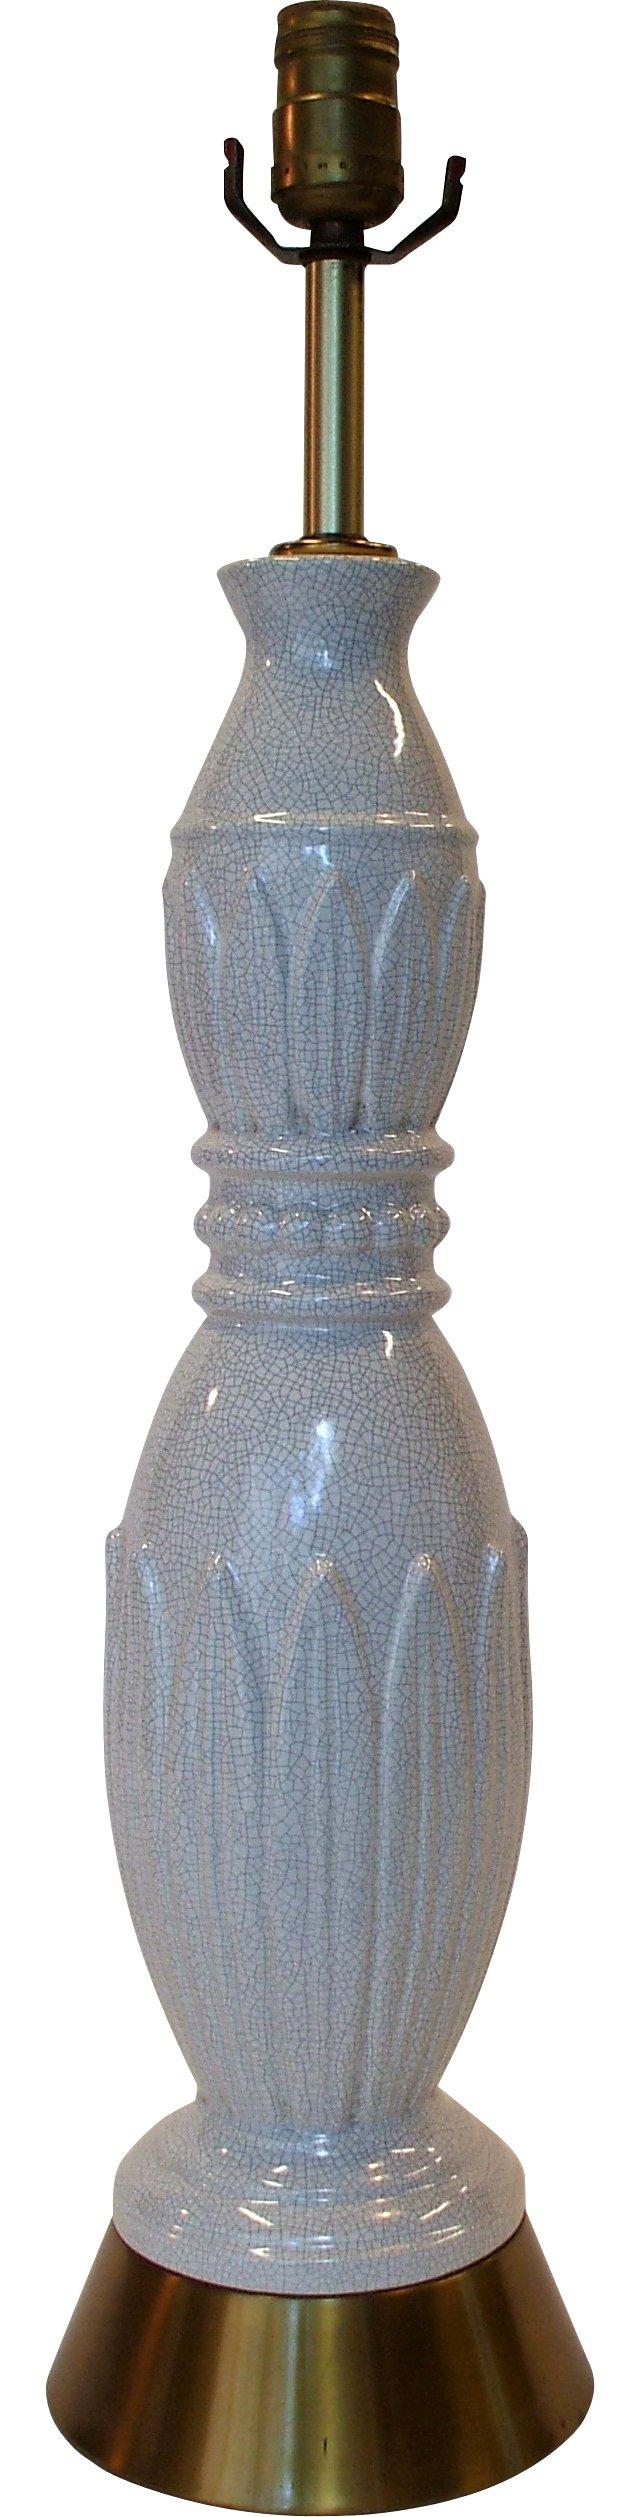 Tall Crackle-Finish Lamp